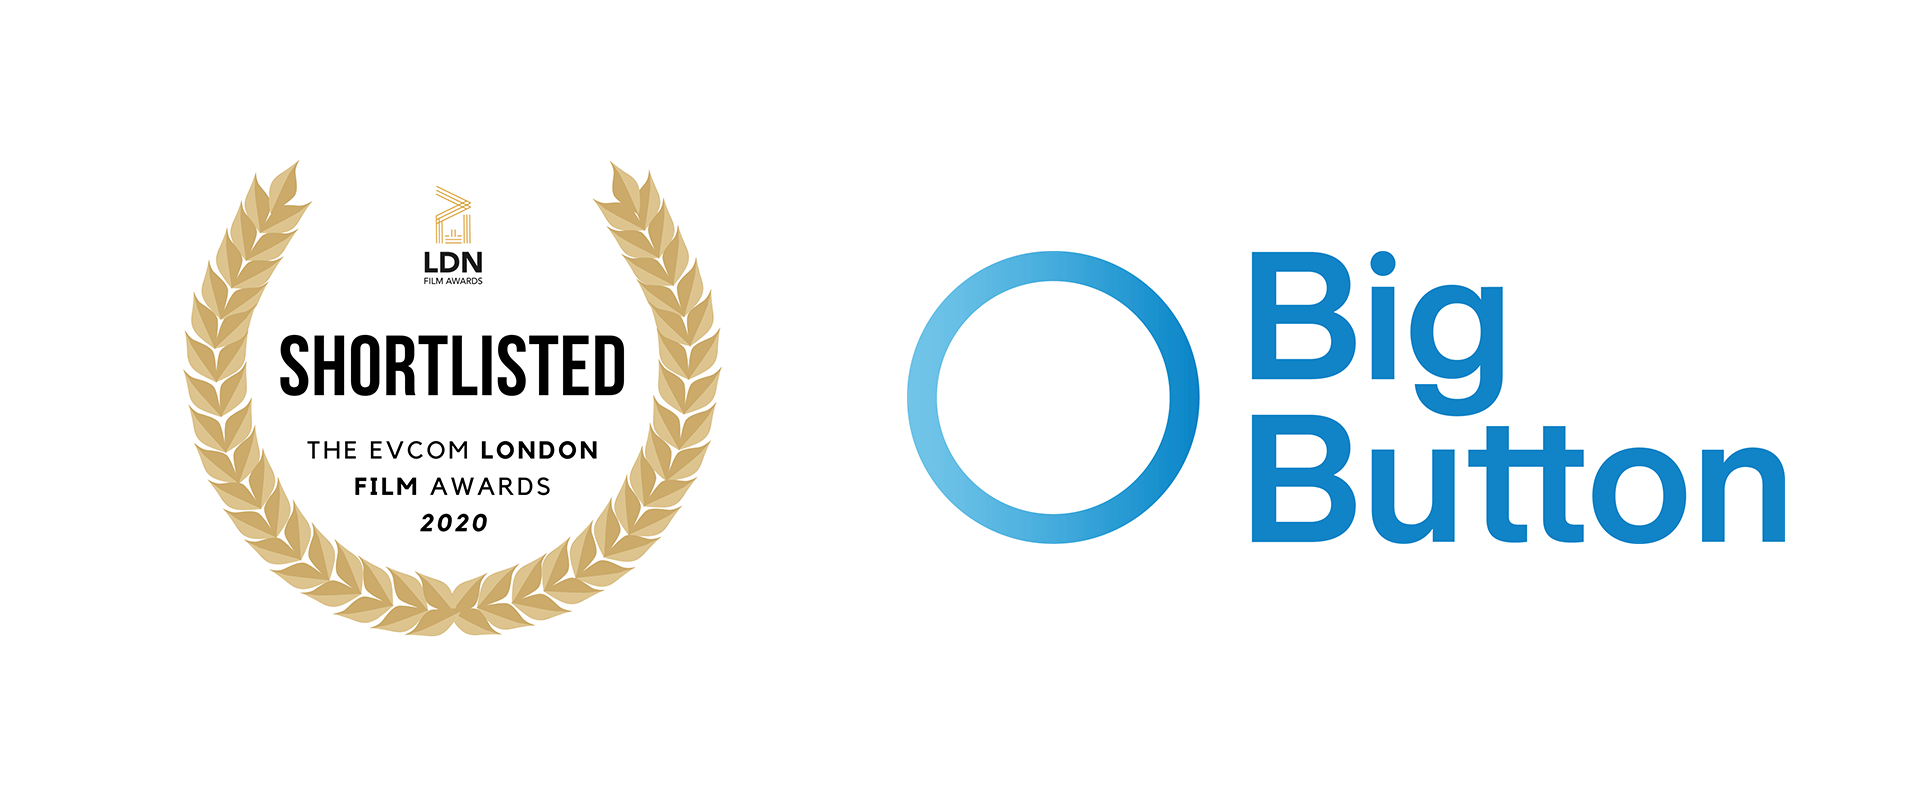 Big Button shortlisted at EVCOM Film Awards 2020